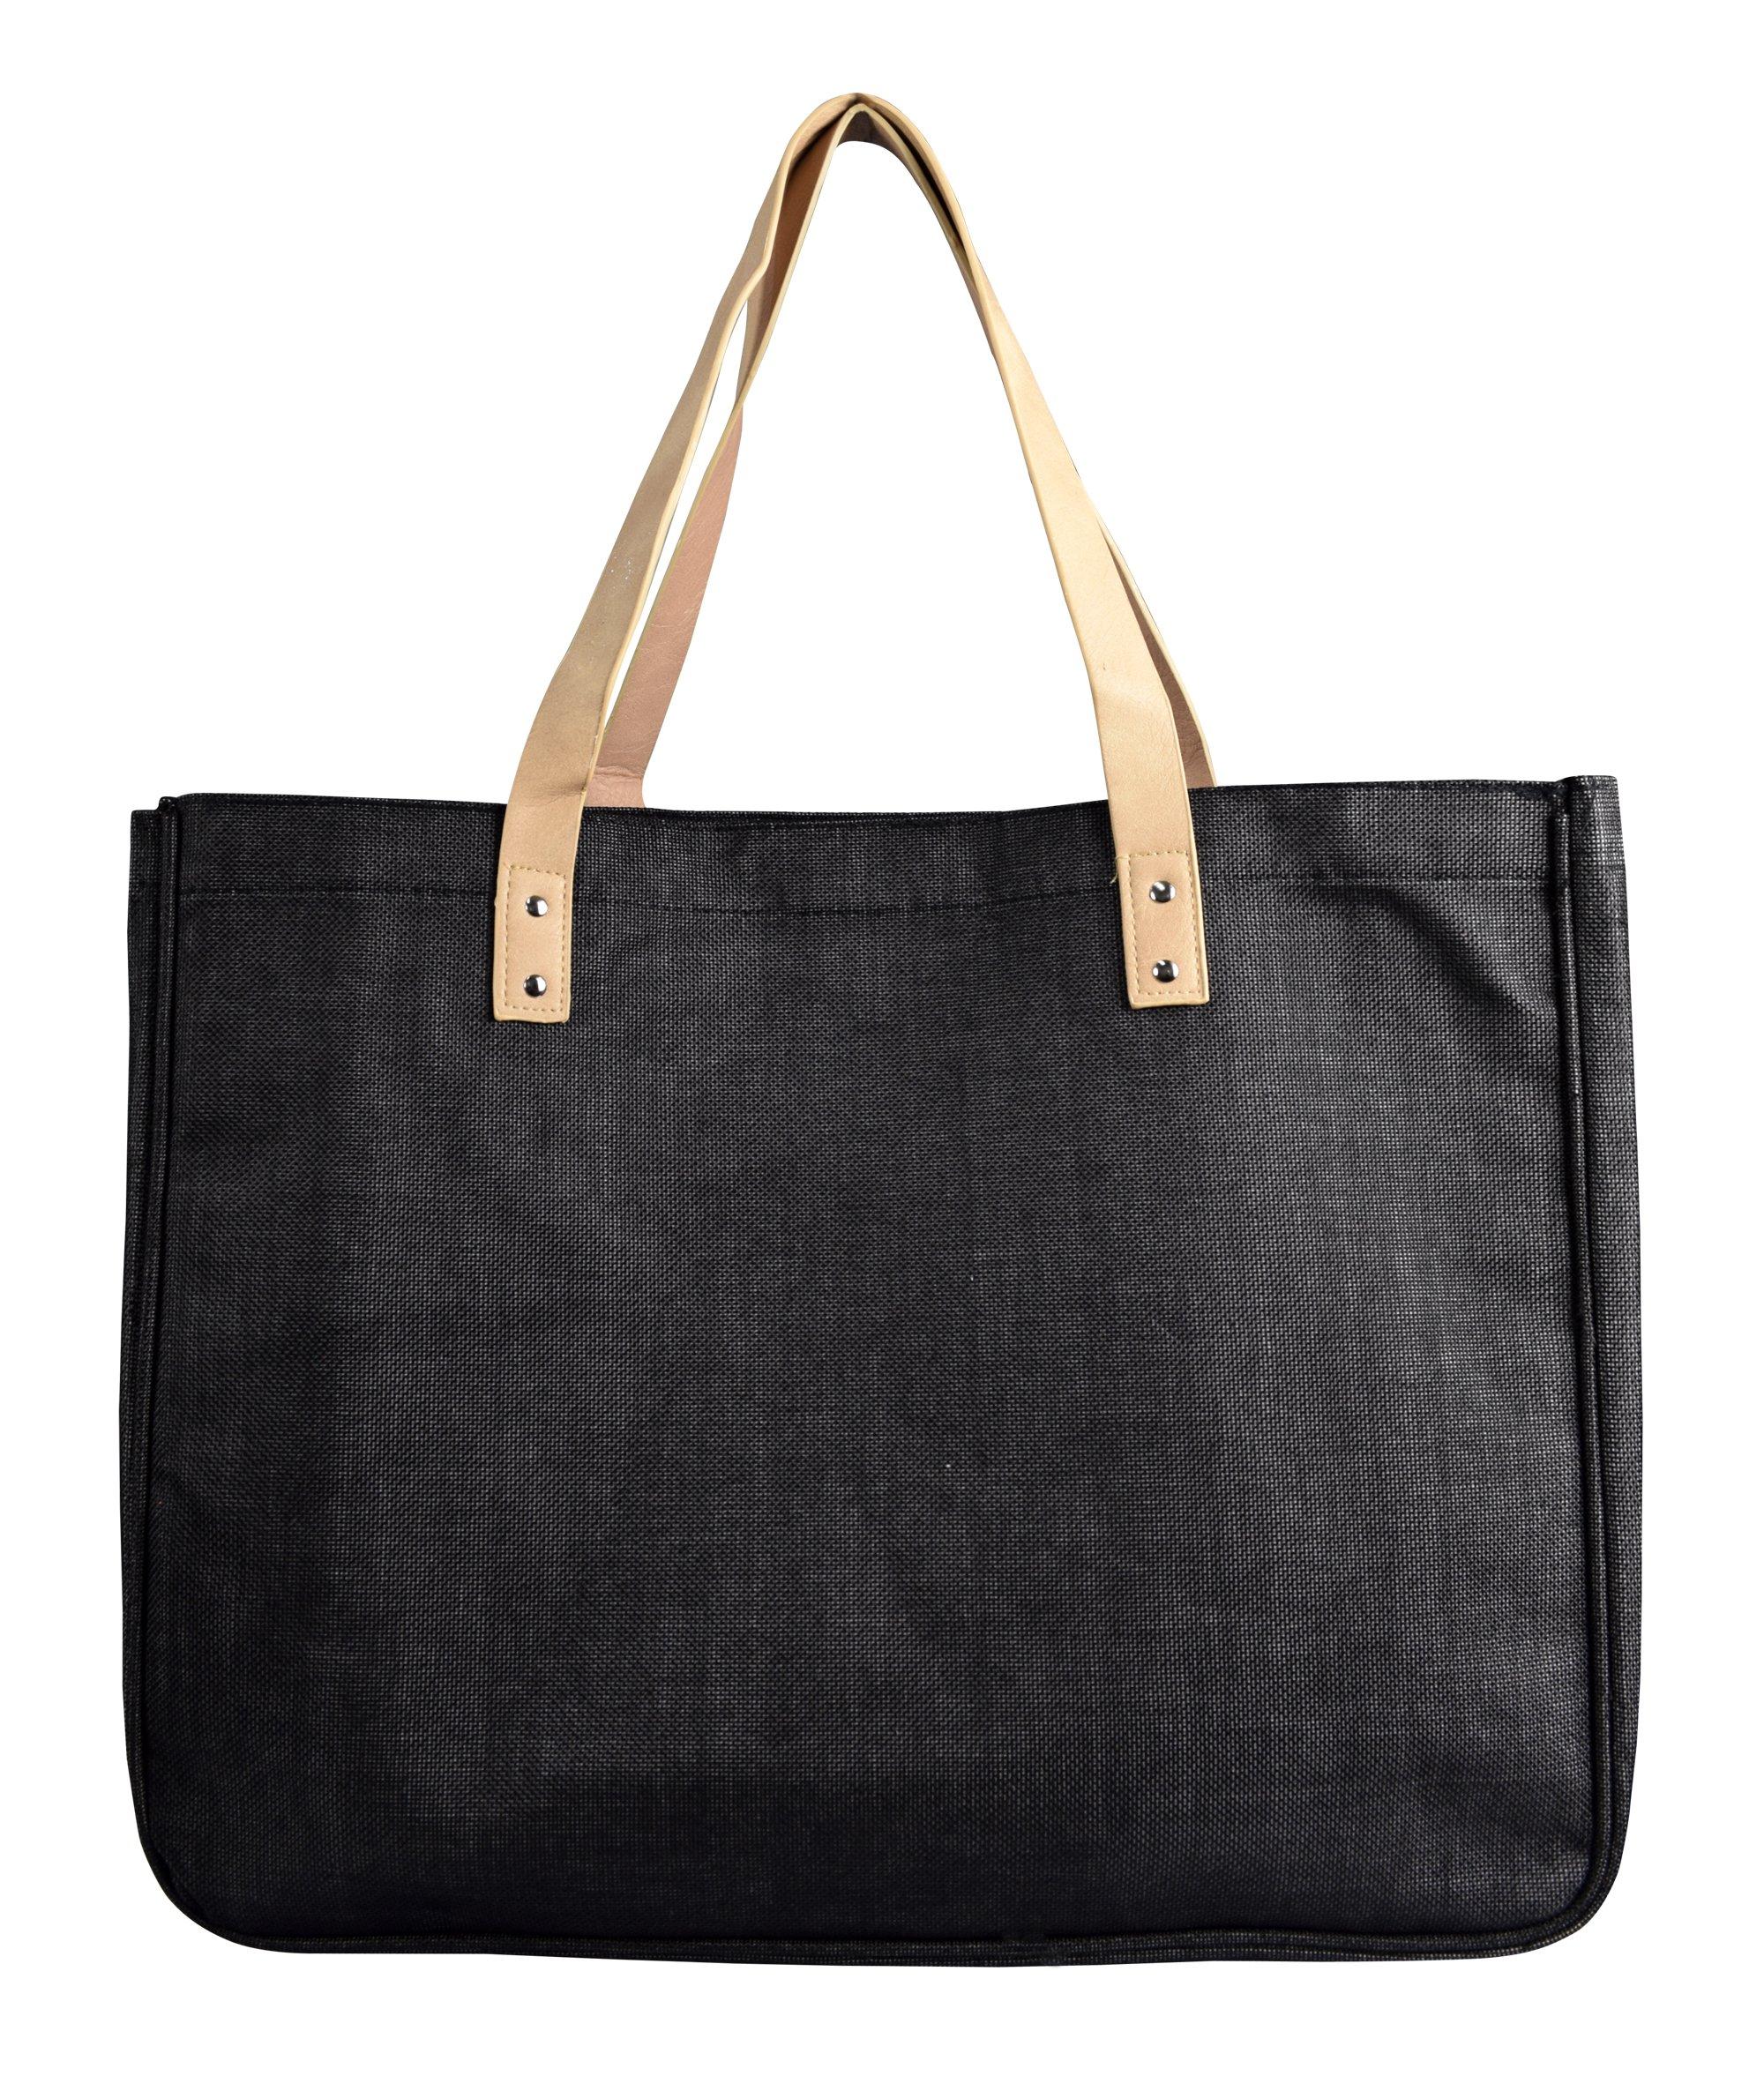 Peach Couture Denim Jeans Handbags Hobos Large Travel Tote Bags Shoulder Bags (Denim Black)